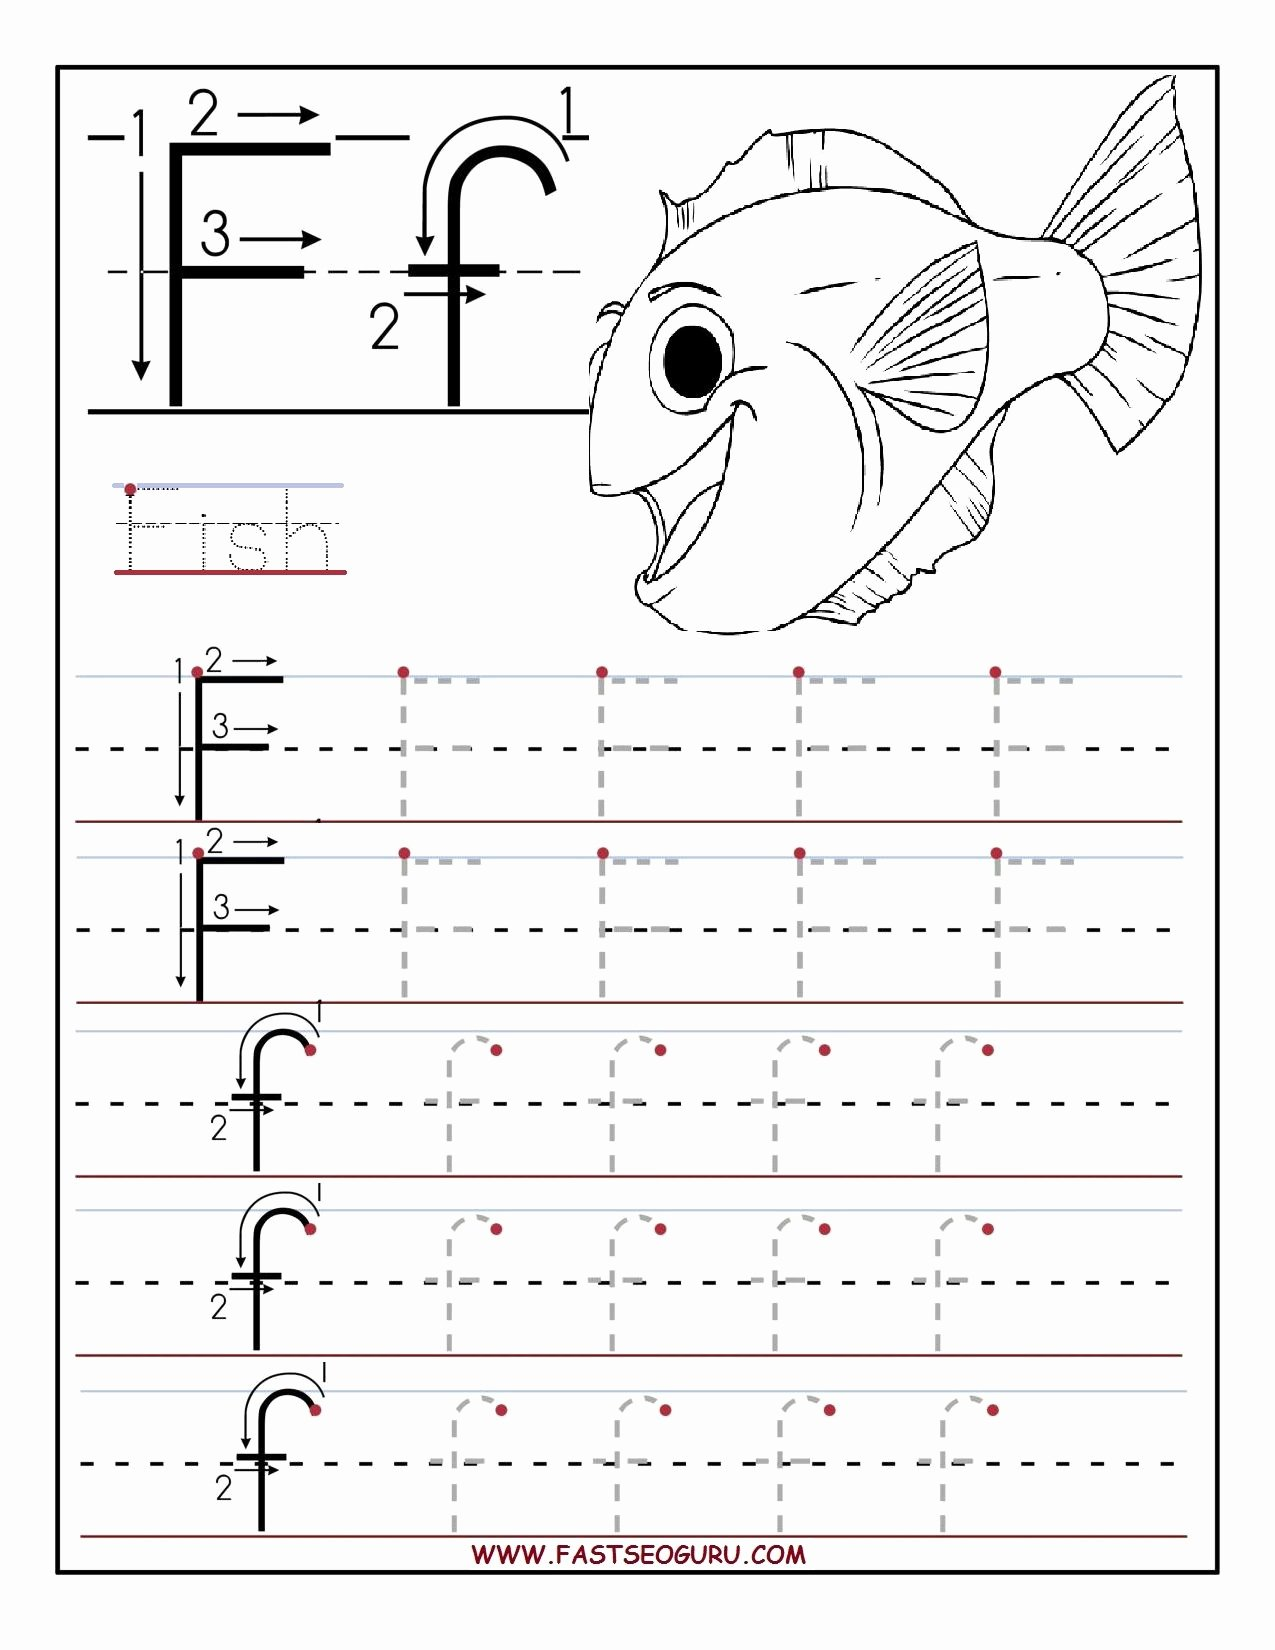 Printable Alphabet Worksheets for Preschoolers Ideas Printable Letter F Tracing Worksheets for Preschool